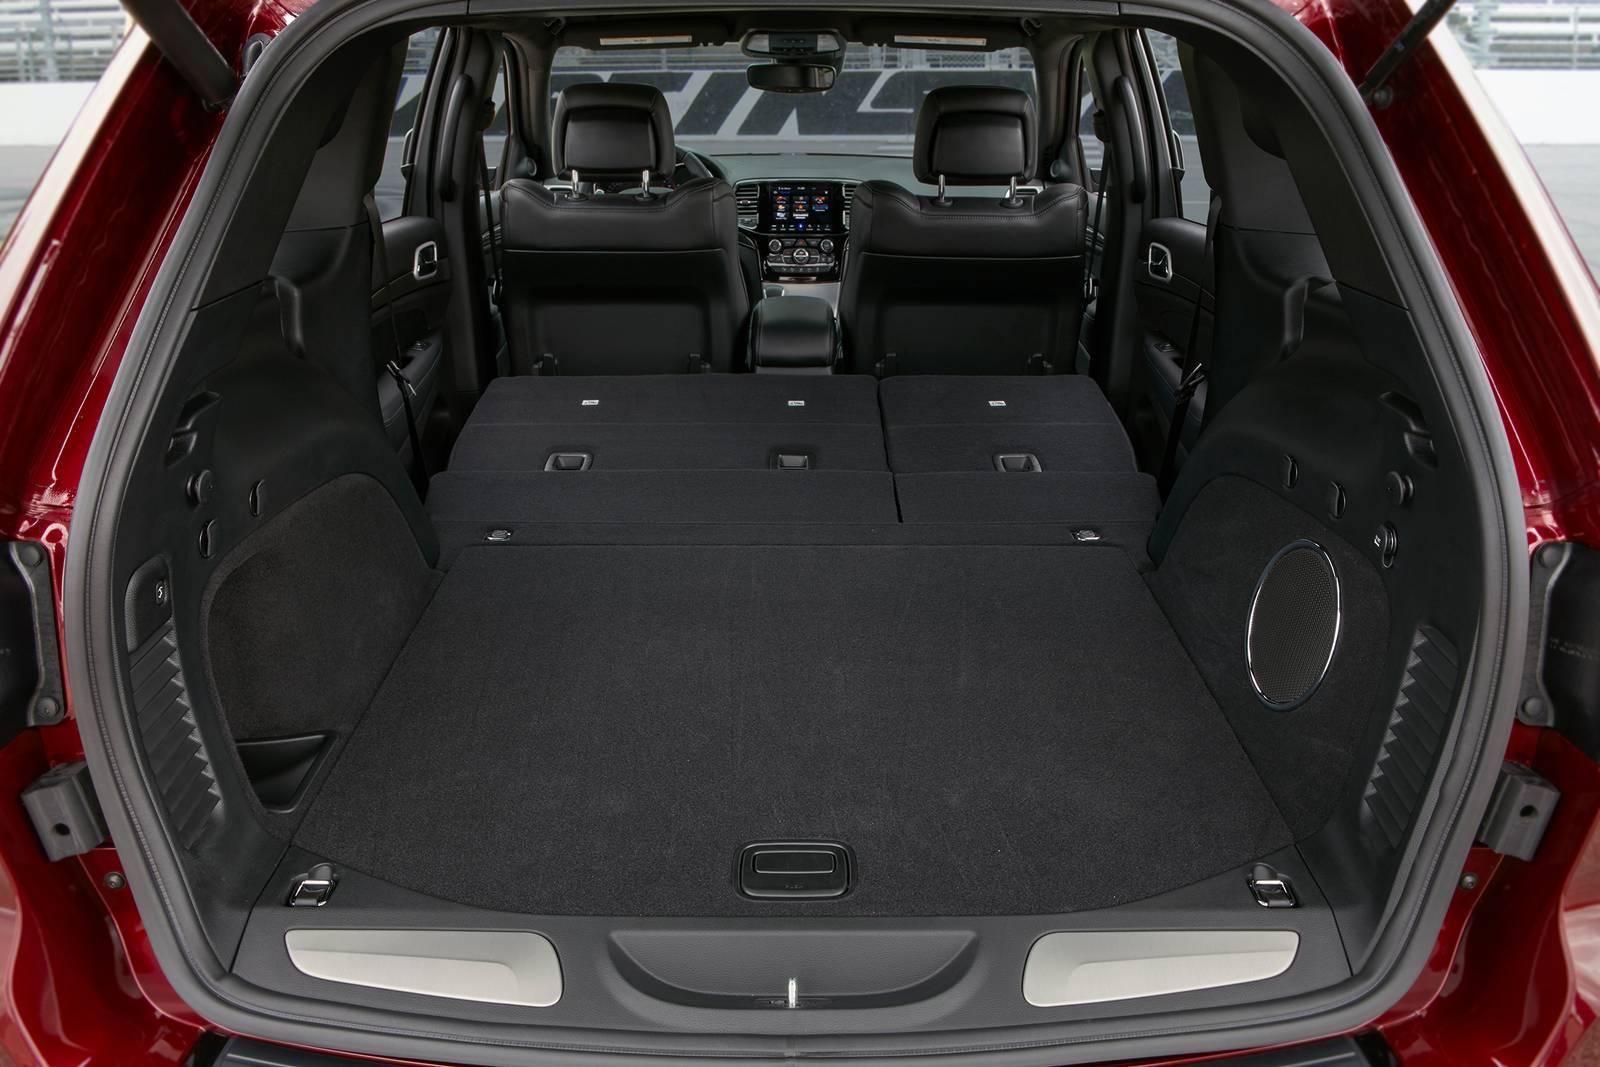 2019 Jeep Grand-Cherokee Cargo Space